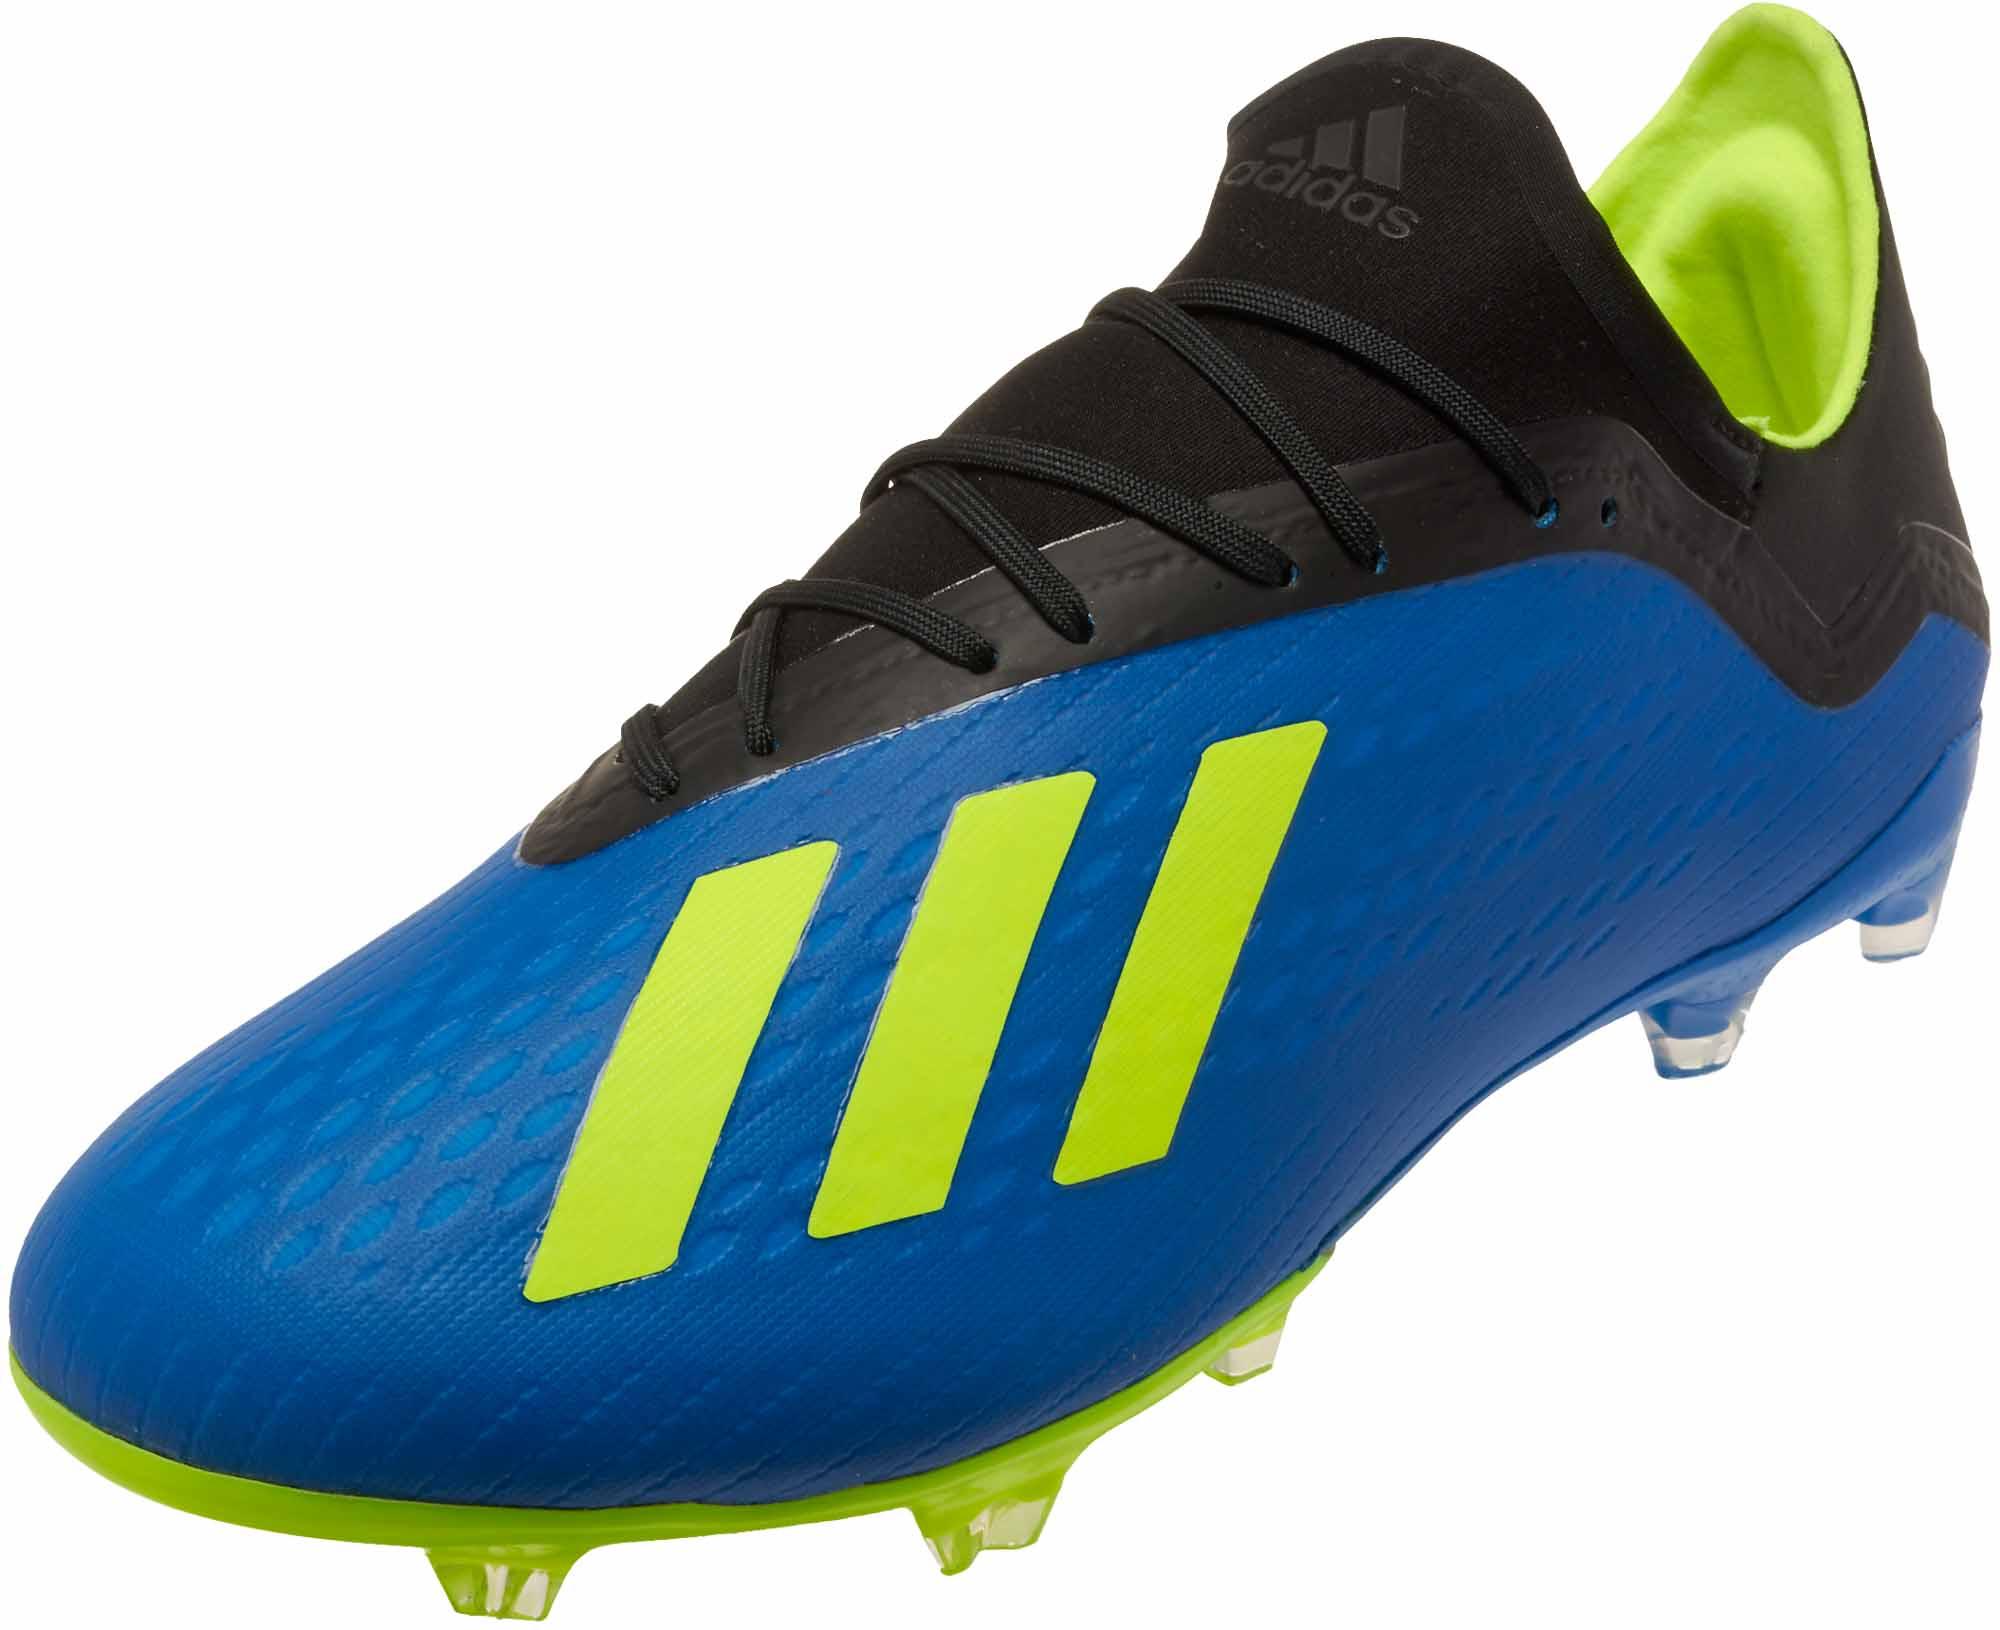 Adidas X 182 Fg Football Bluesolar Yellowblack